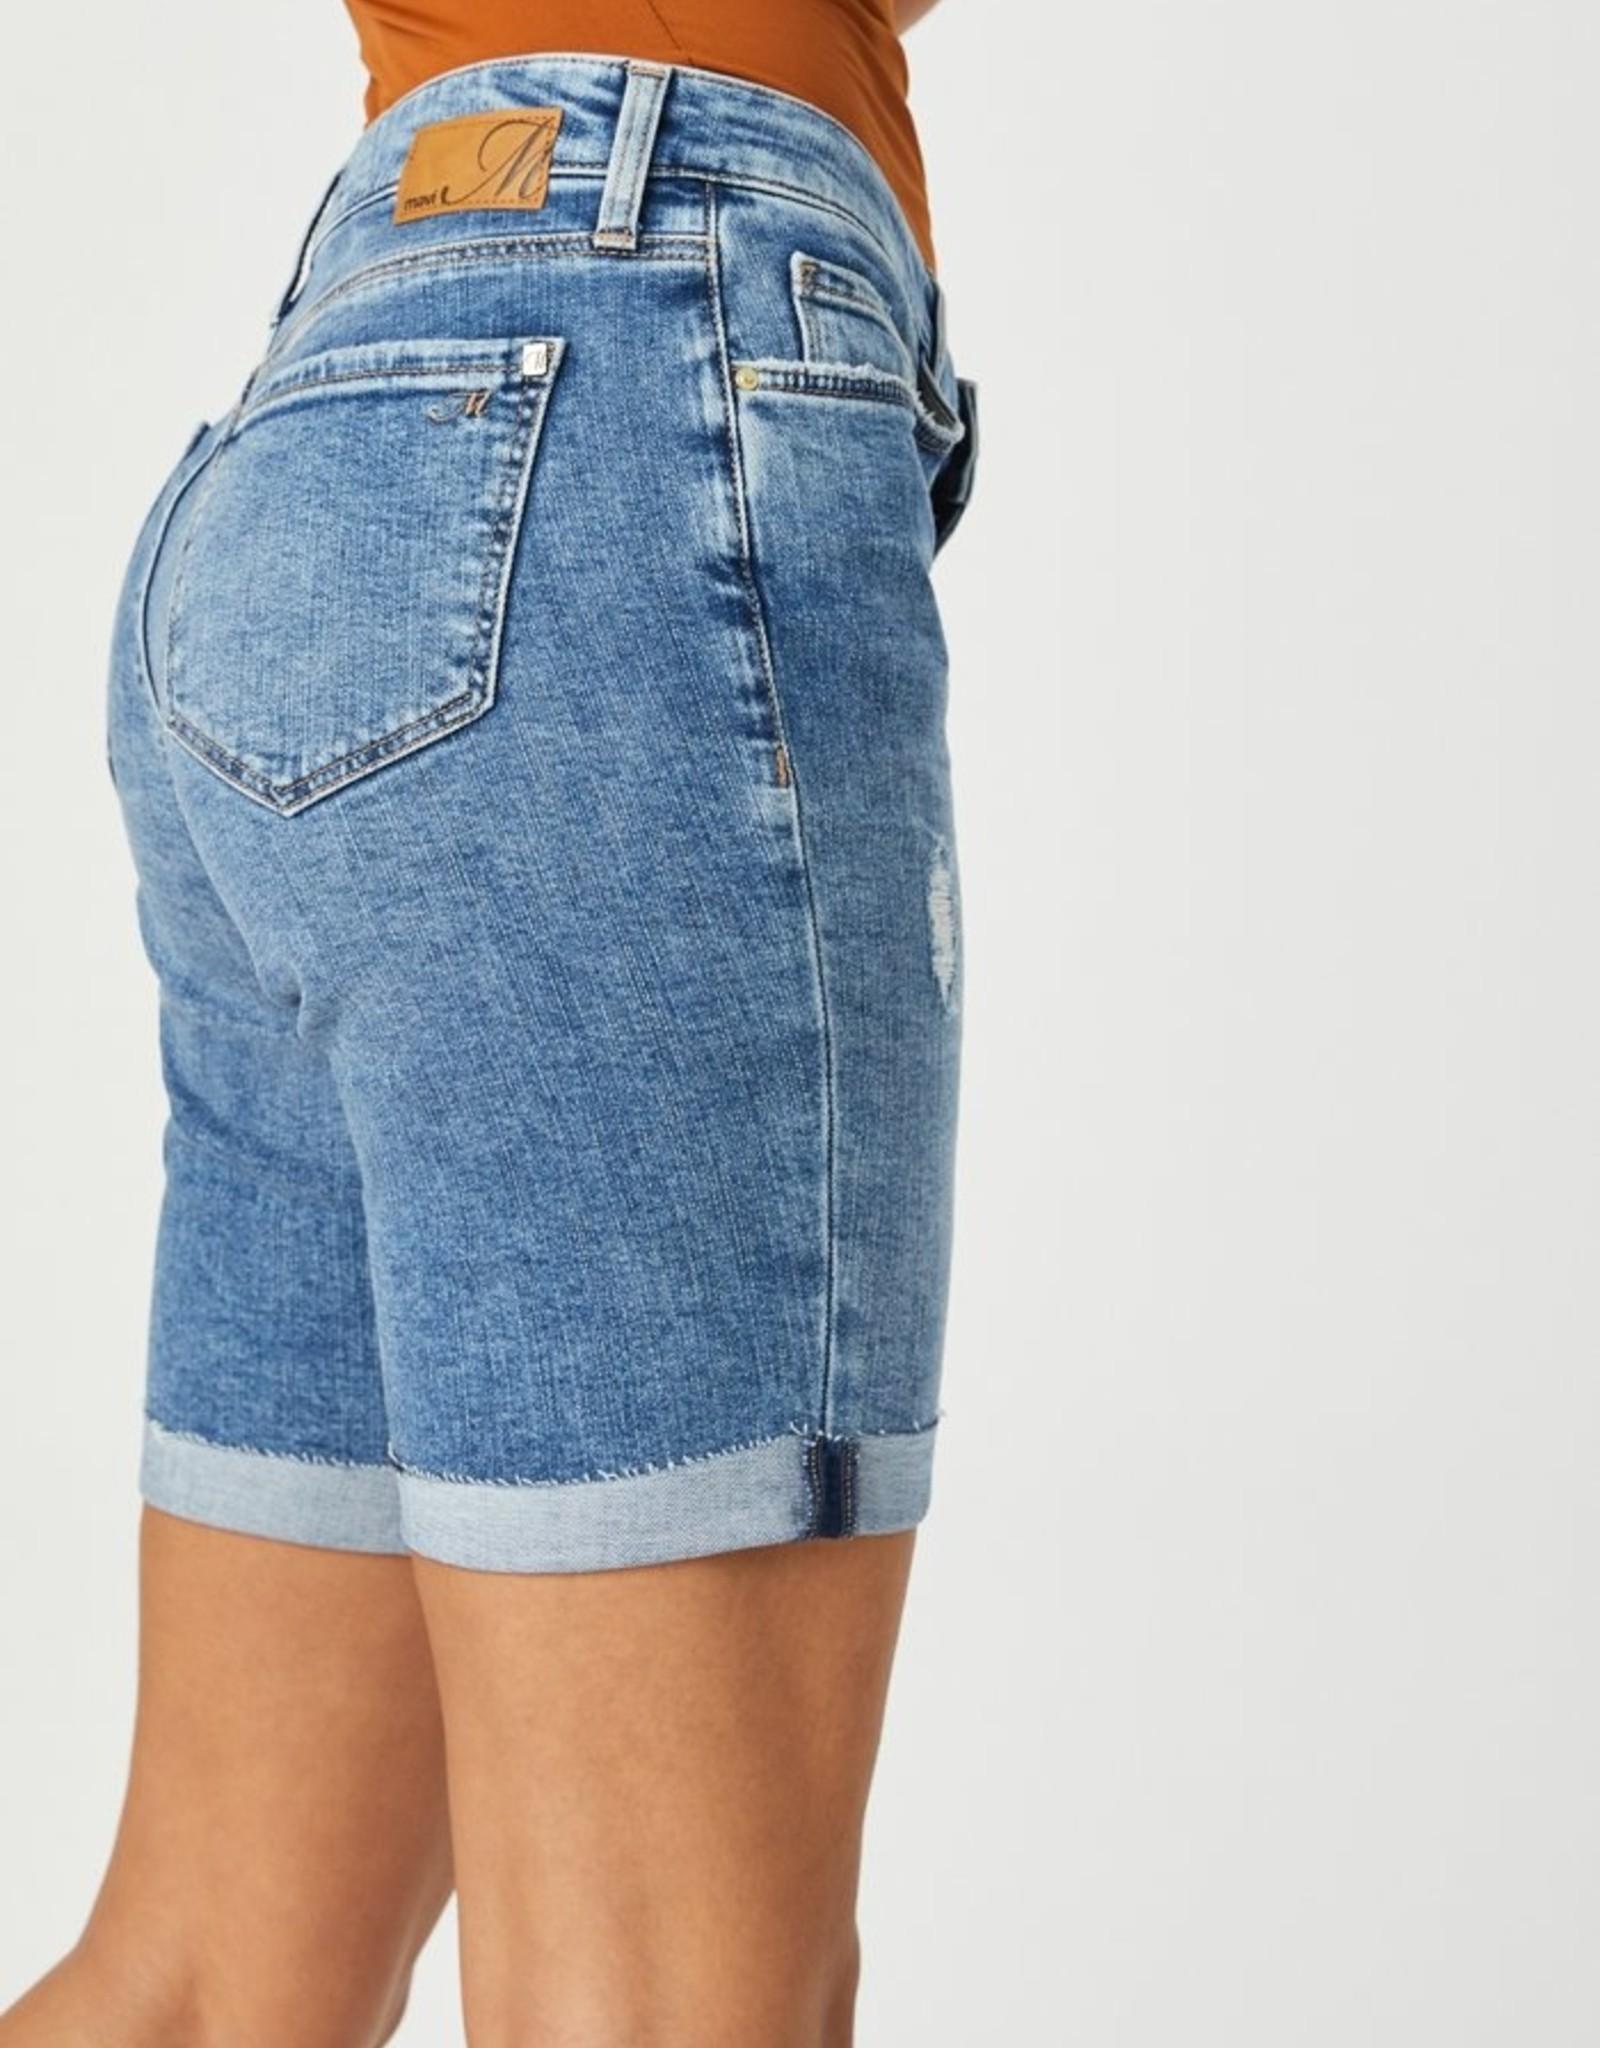 Mavi Alexis Shorts